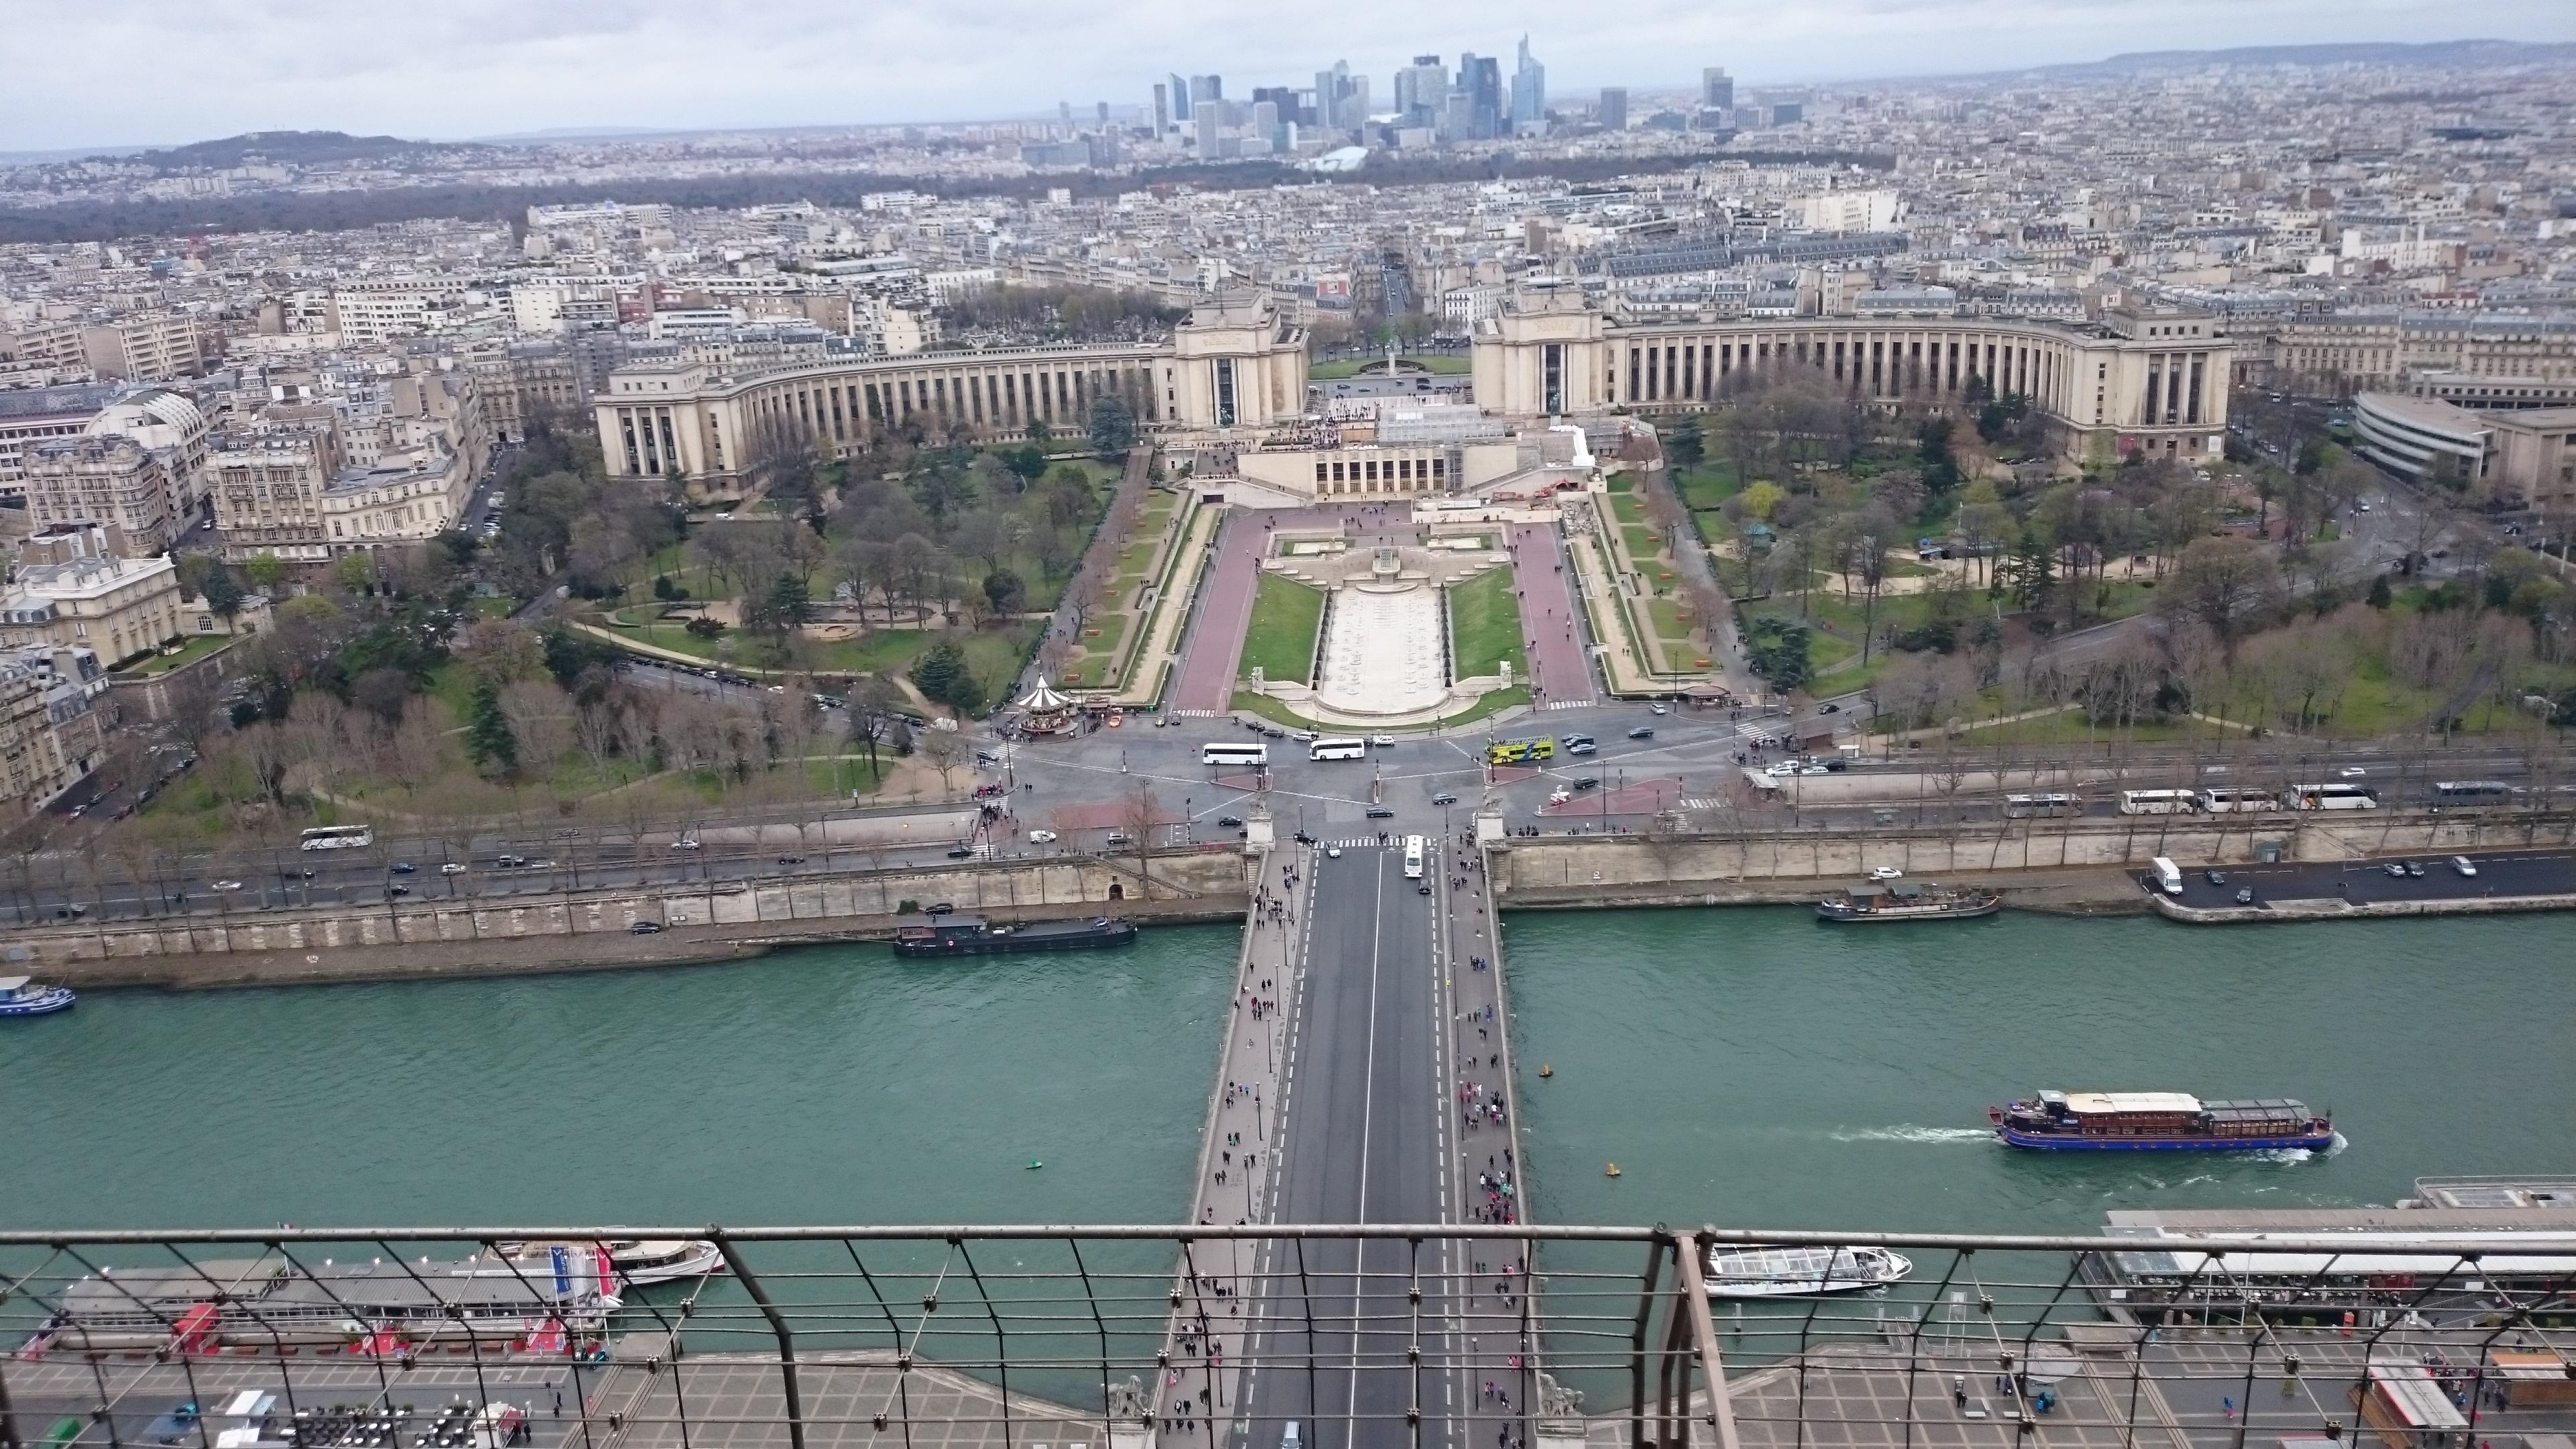 DSC 1945 - Visitando la Torre Eiffel en Paris